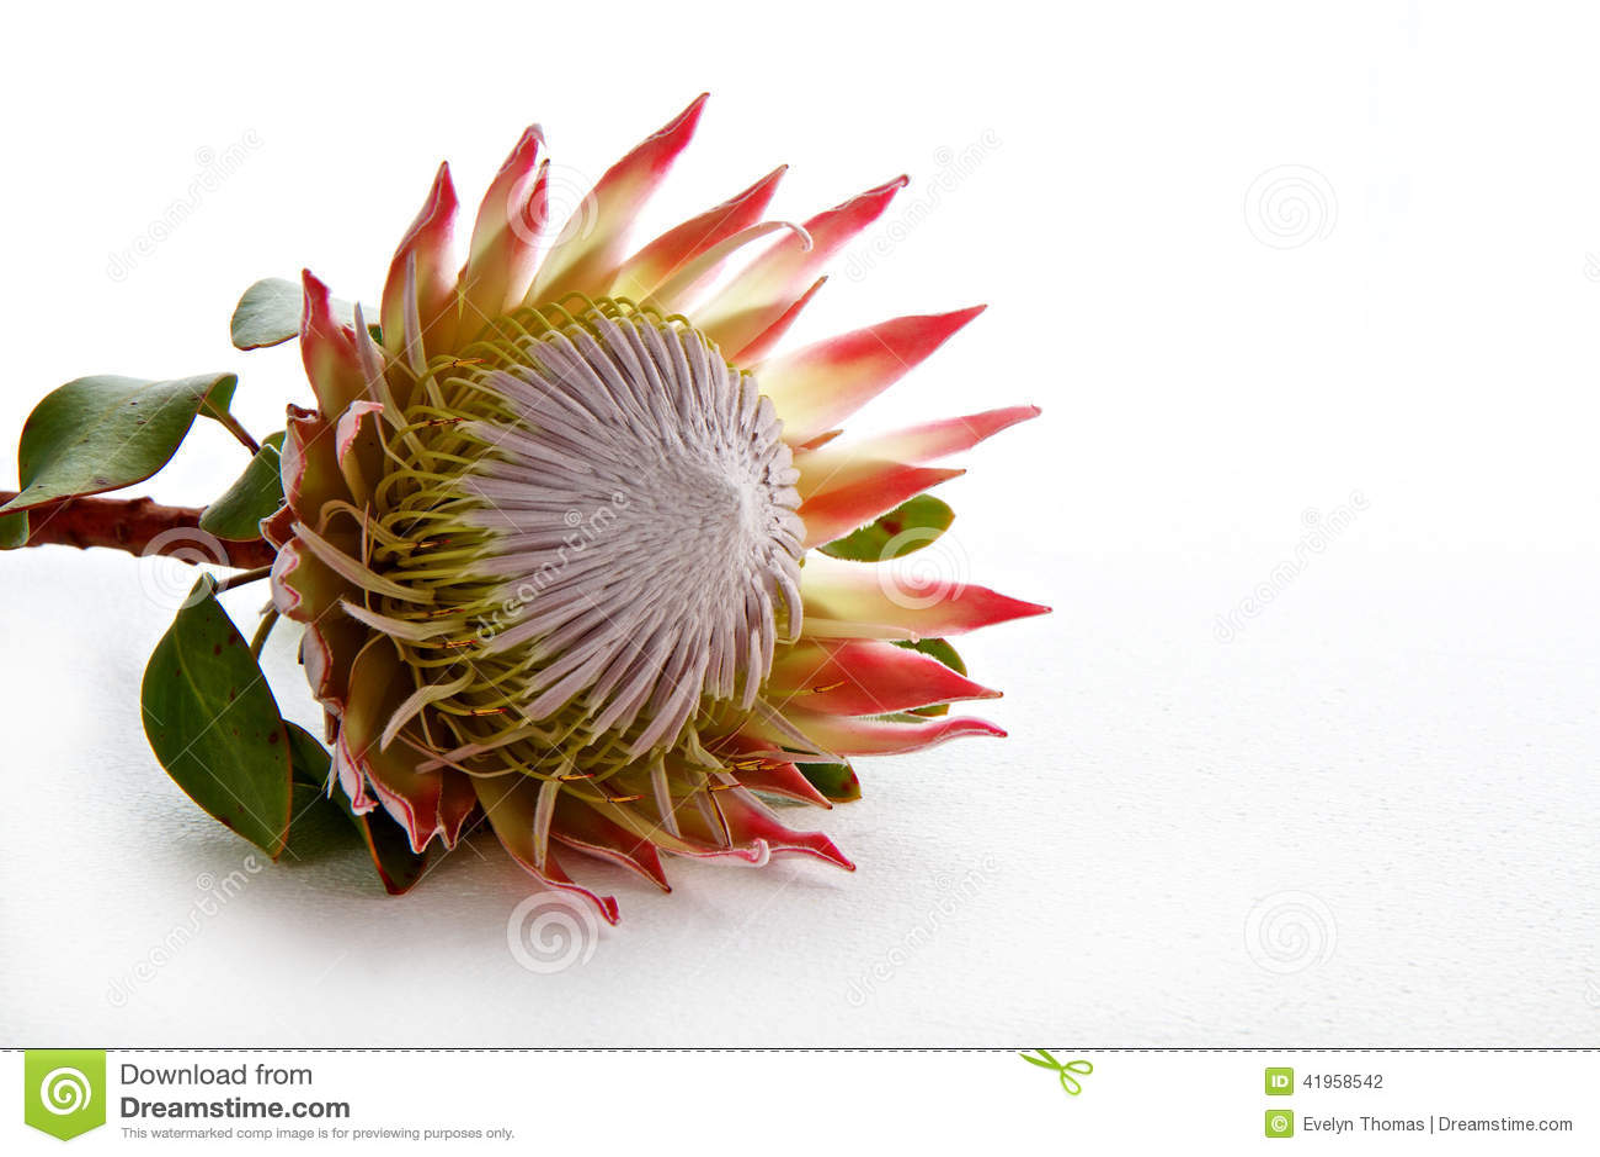 Protea Flower Isolated On White Background Stock Photo - Image ...